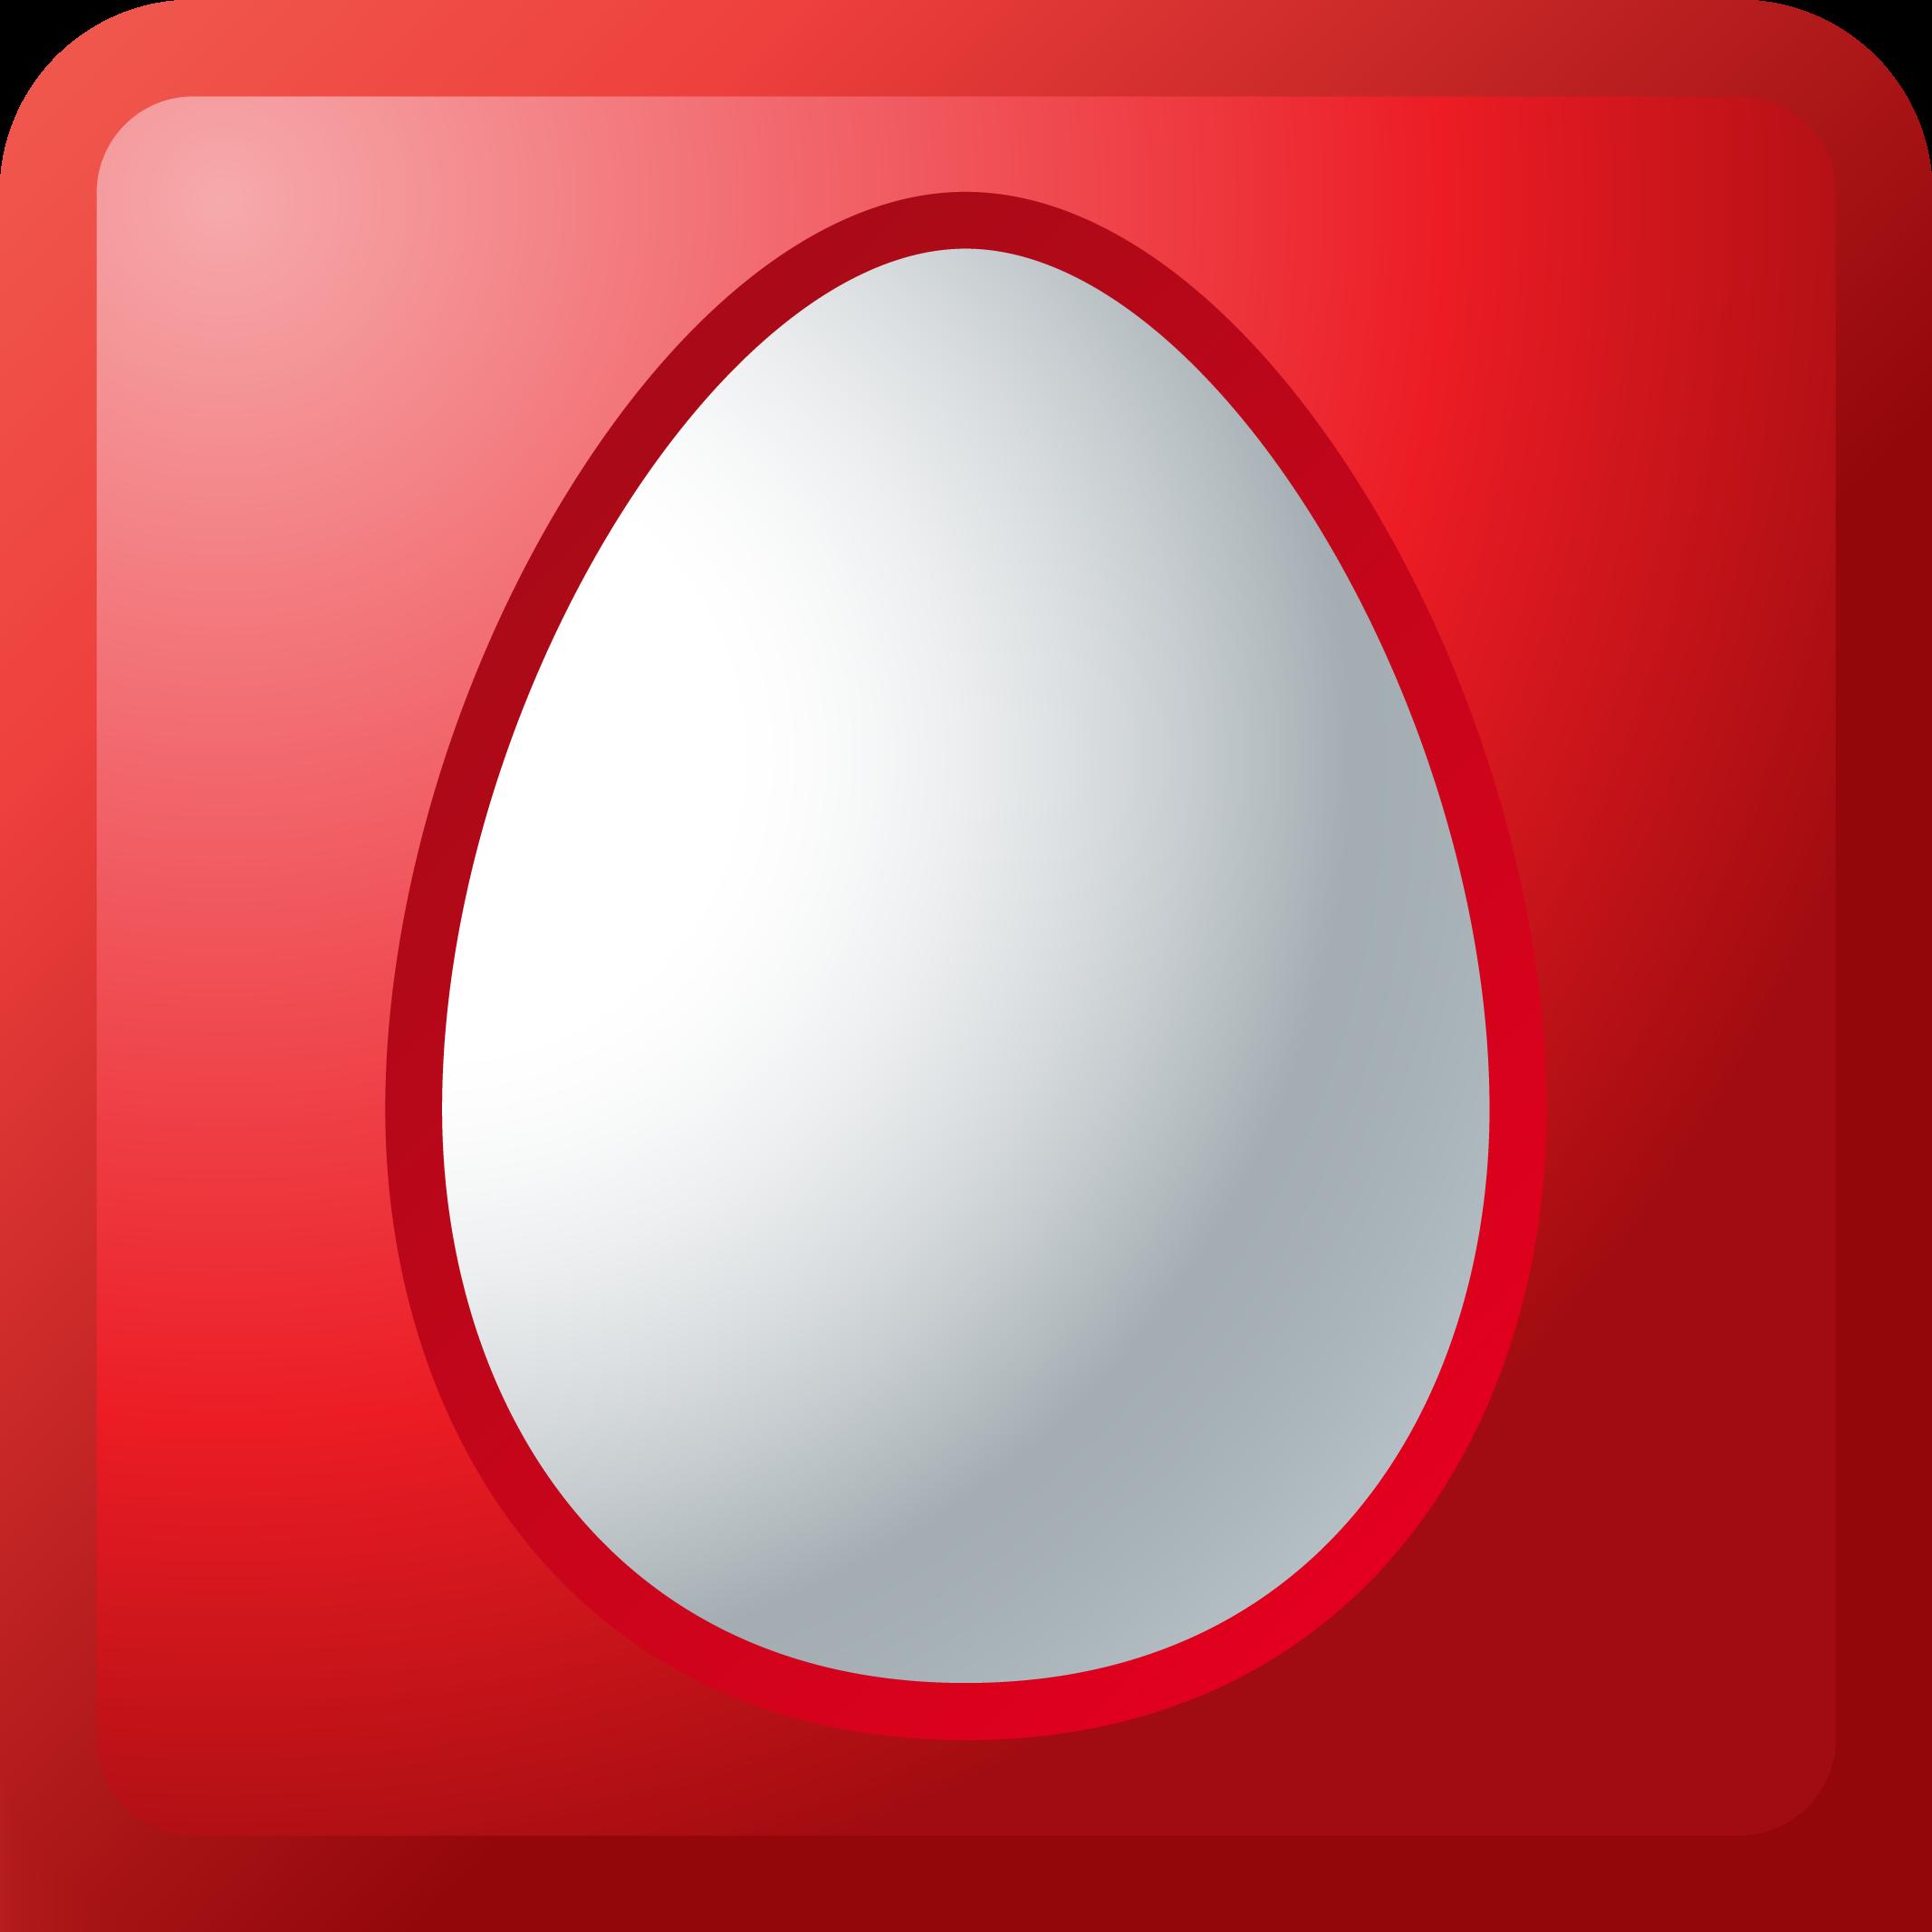 Логотипы Операторов Мтс - deliveryprikaz: http://deliveryprikaz.weebly.com/blog/logotipi-operatorov-mts